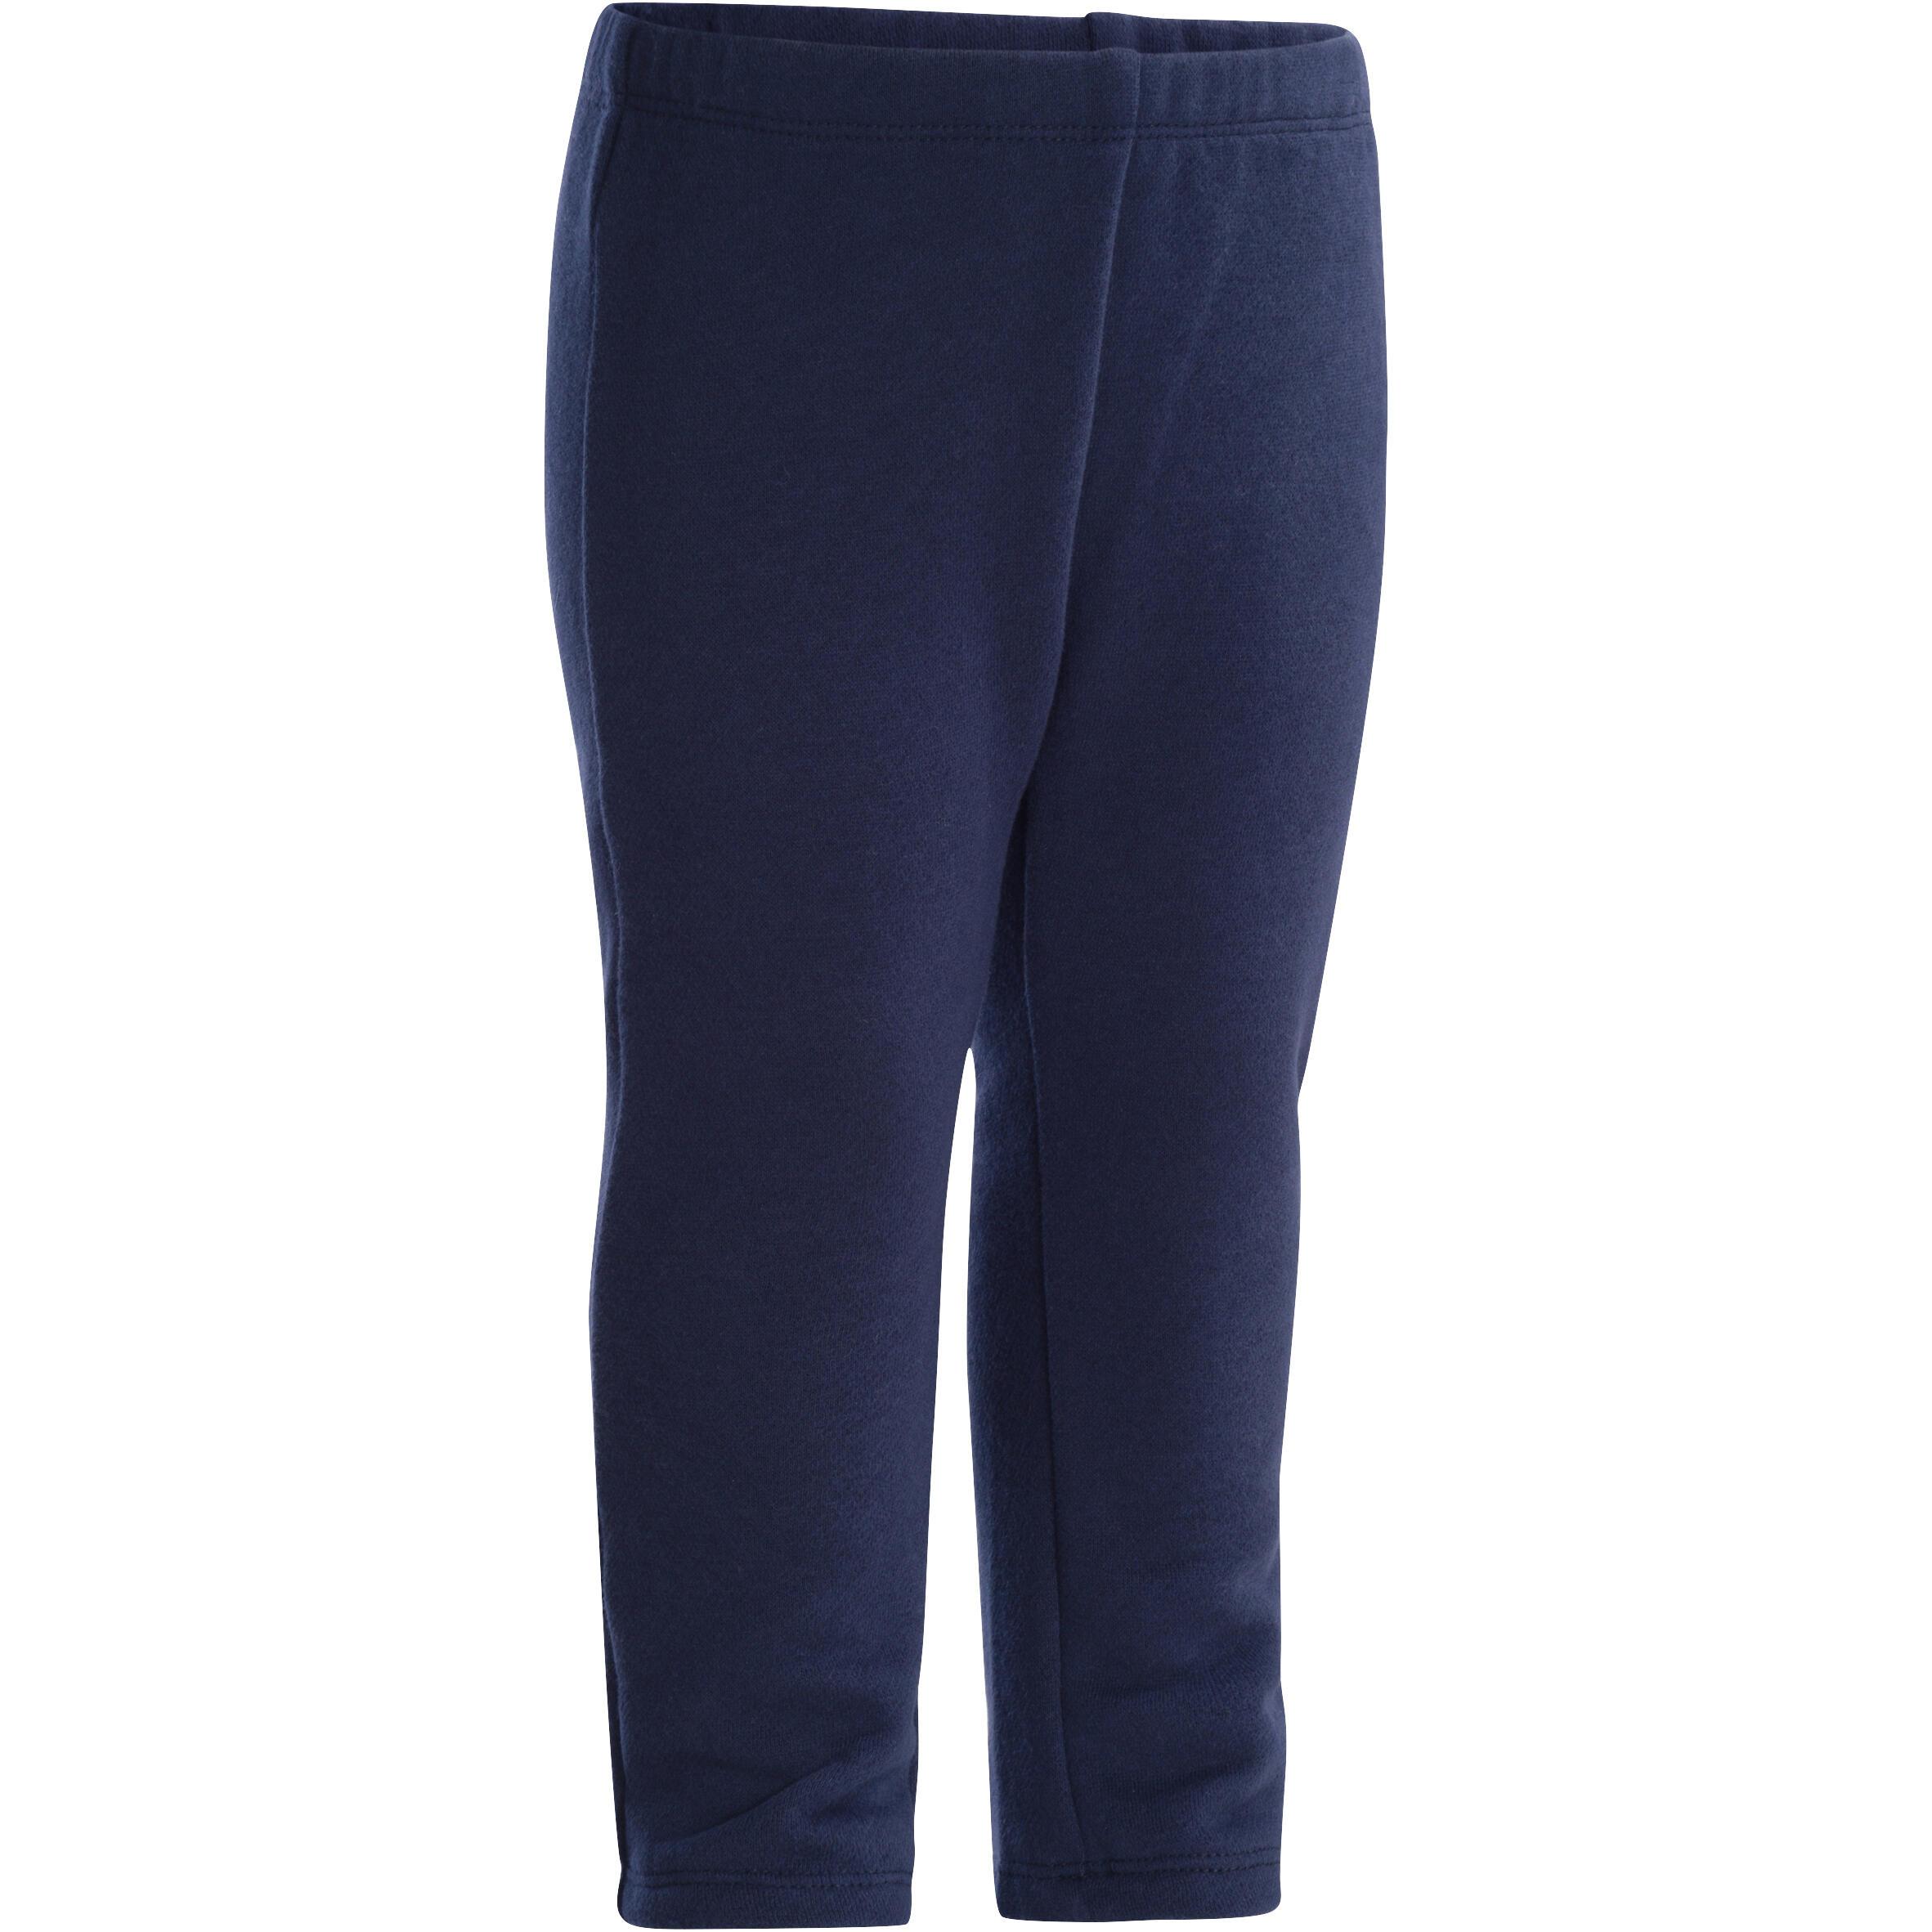 Pantalón deportivo cálido gimnasia infantil azul marino Warm'y